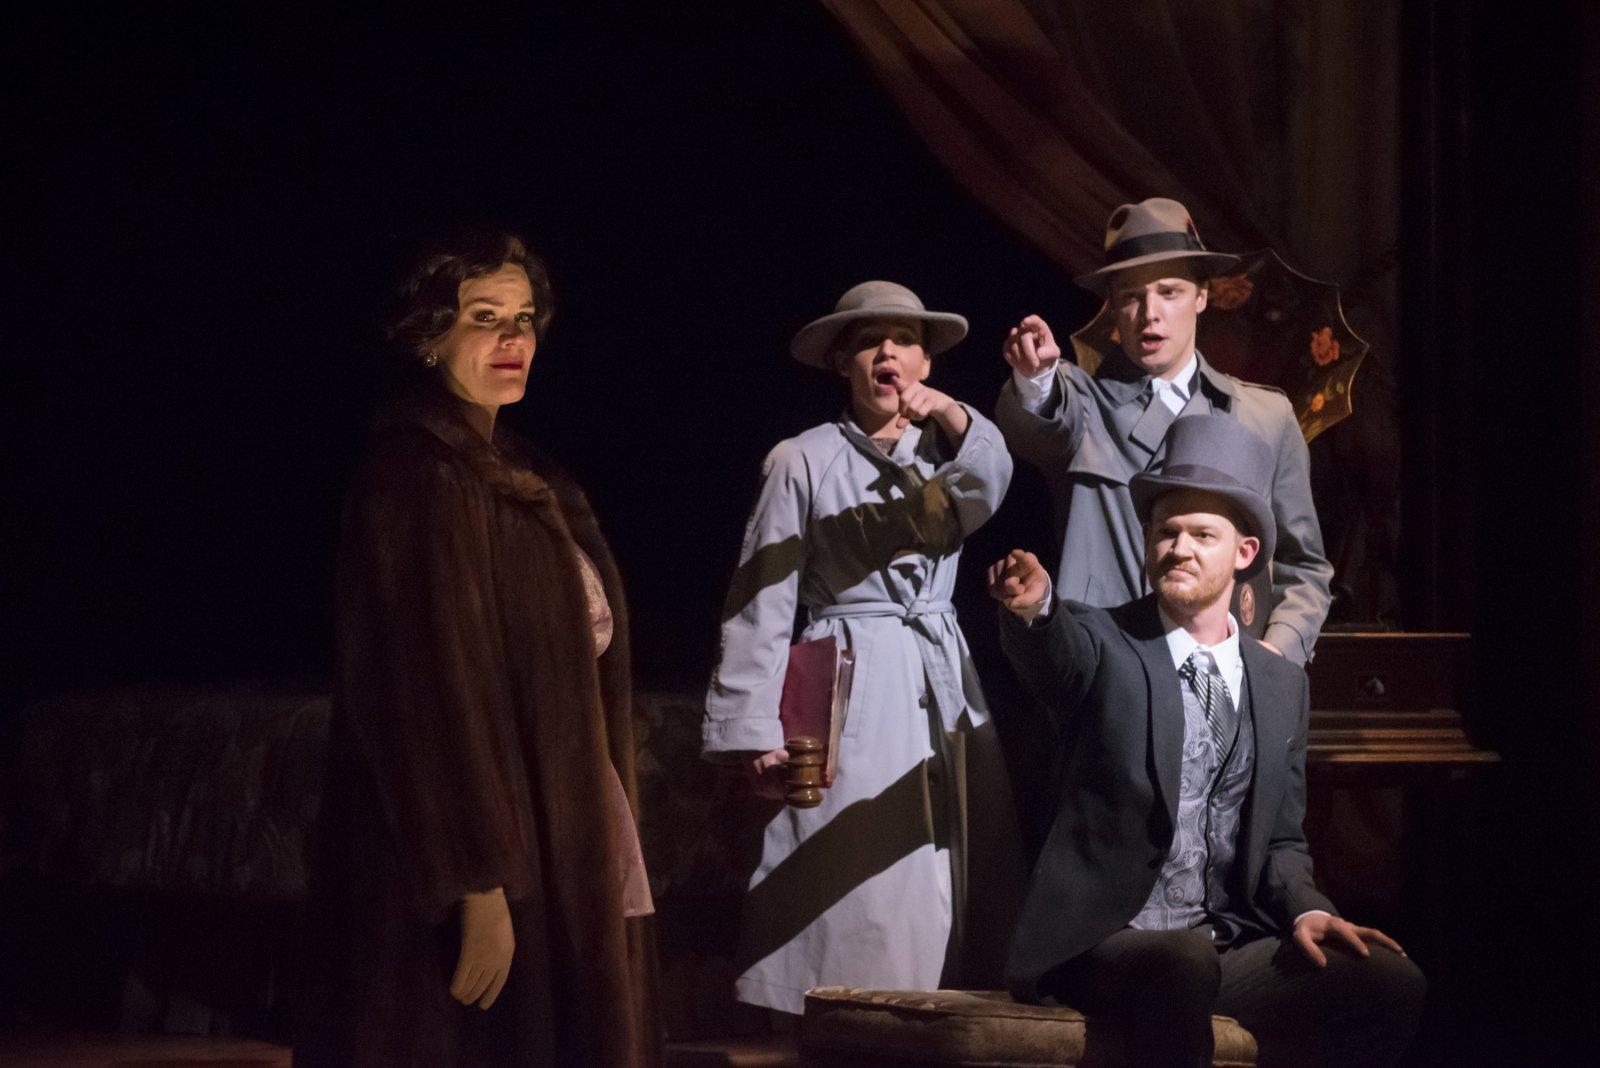 Cassandra Black (Duchess), Benjamin Robinson (Electrician), Kaleigh Rae Gamache' (Maid), Joseph Beutel (Hotel Manager)